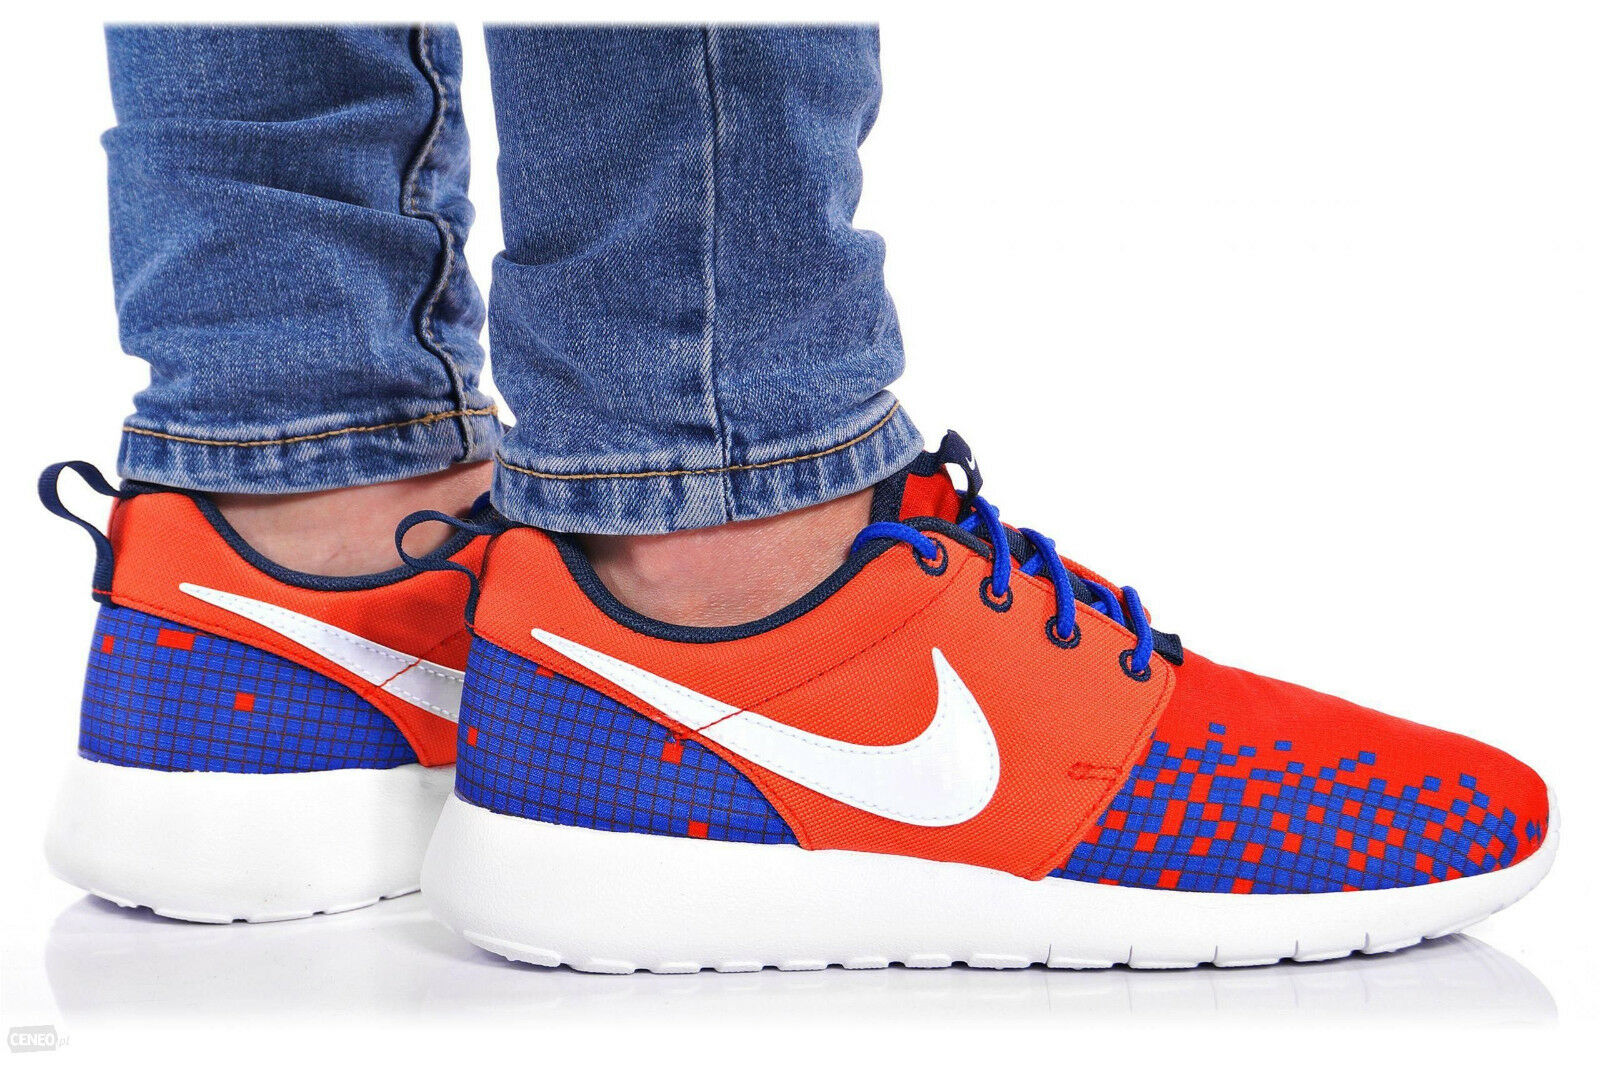 Damenschuhe Nike Nike Damenschuhe Roshe One Print GS Gr:37,5 Presto Moire Sneaker 677782-601 blau-rot 6a109c